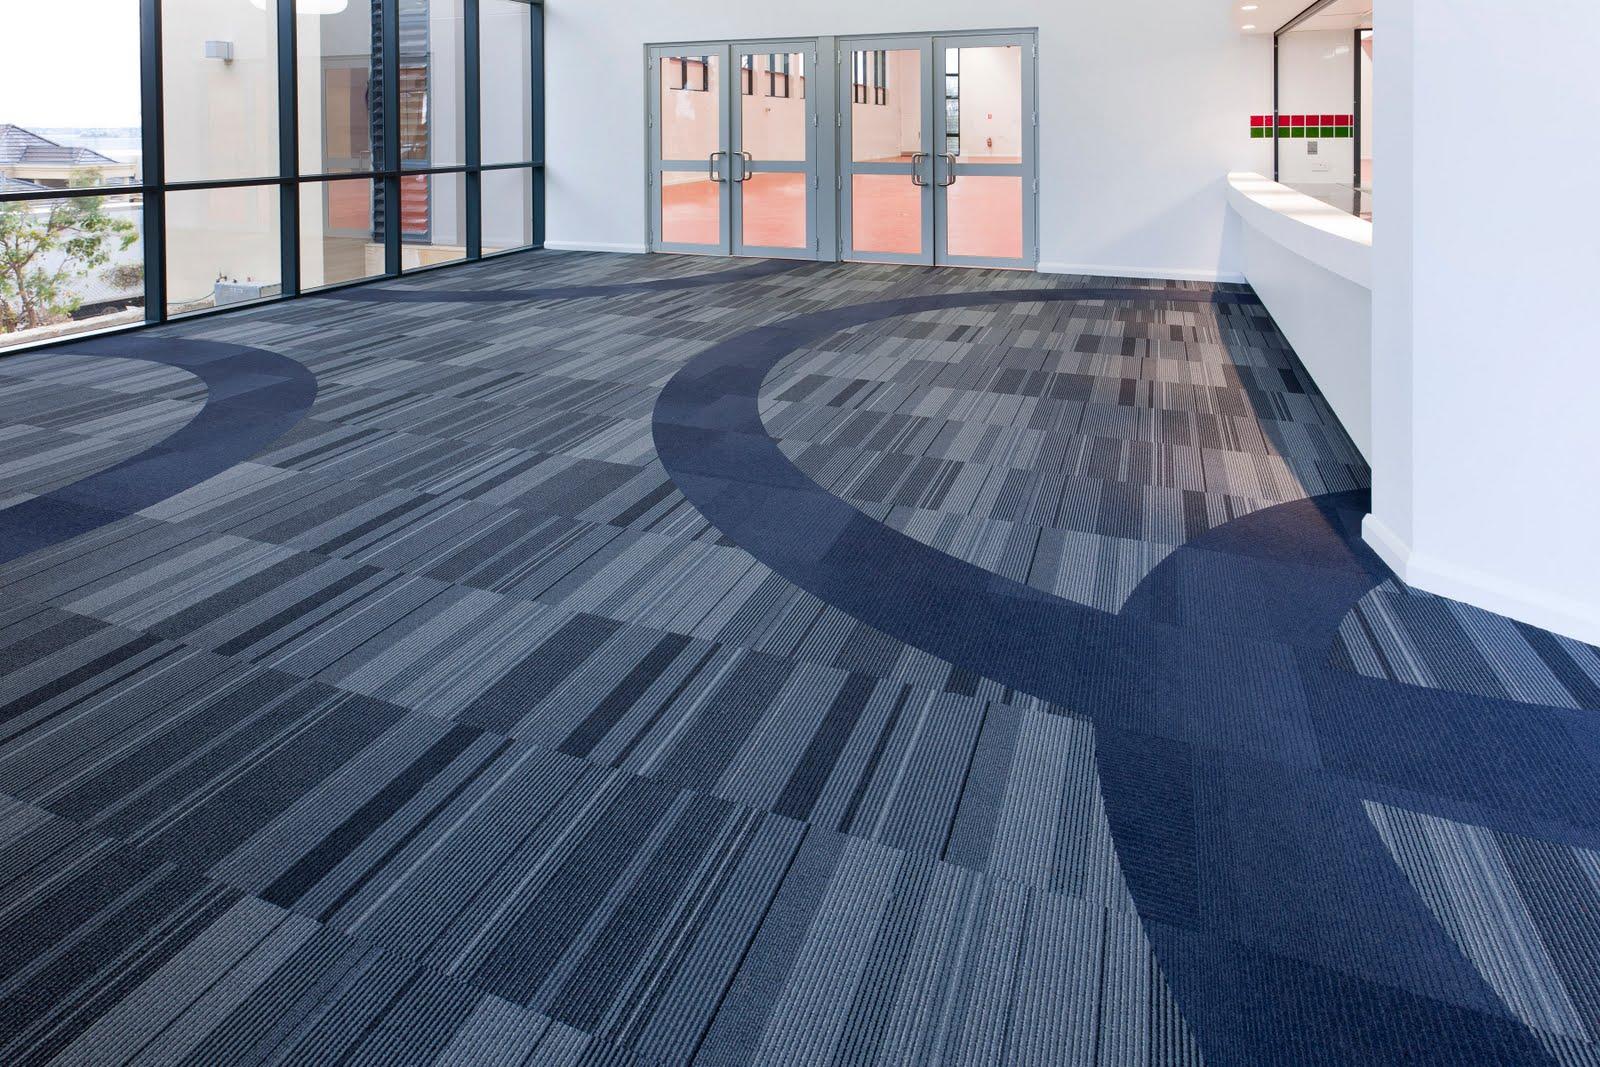 How to lay vinyl flooring and carpet floor tiles - Homebase